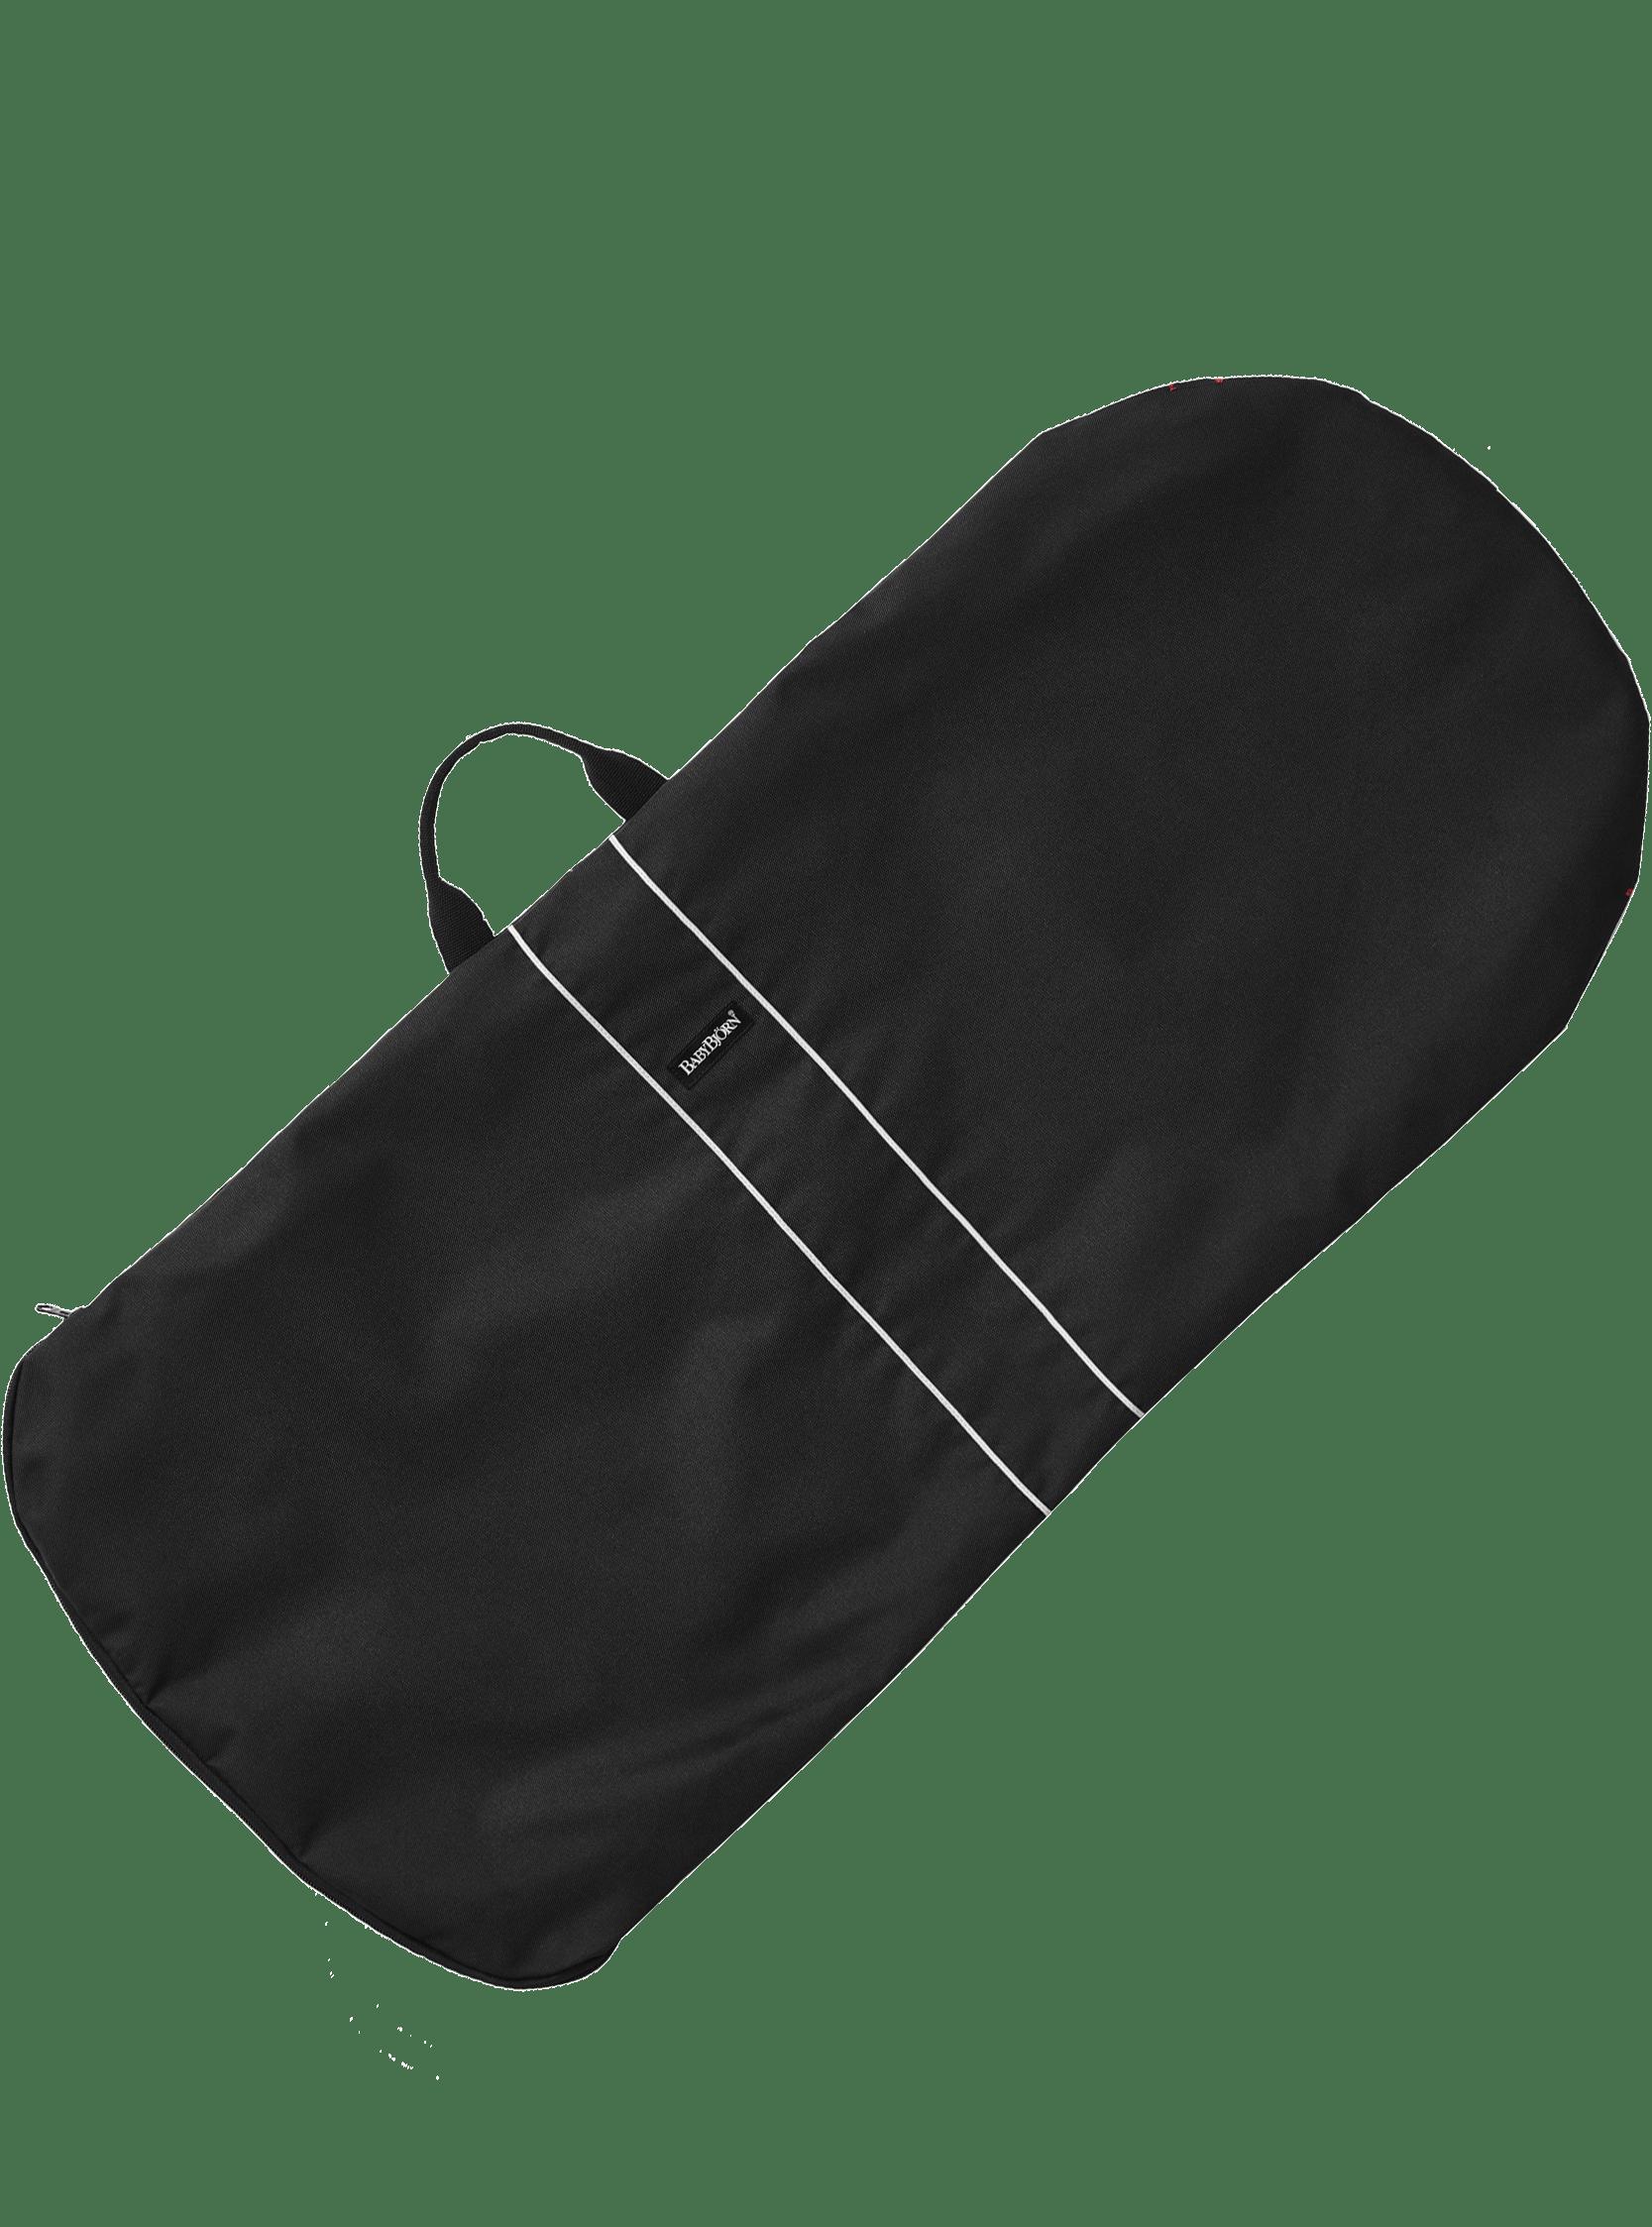 BABYBJORN Transport bag for baby bouncer